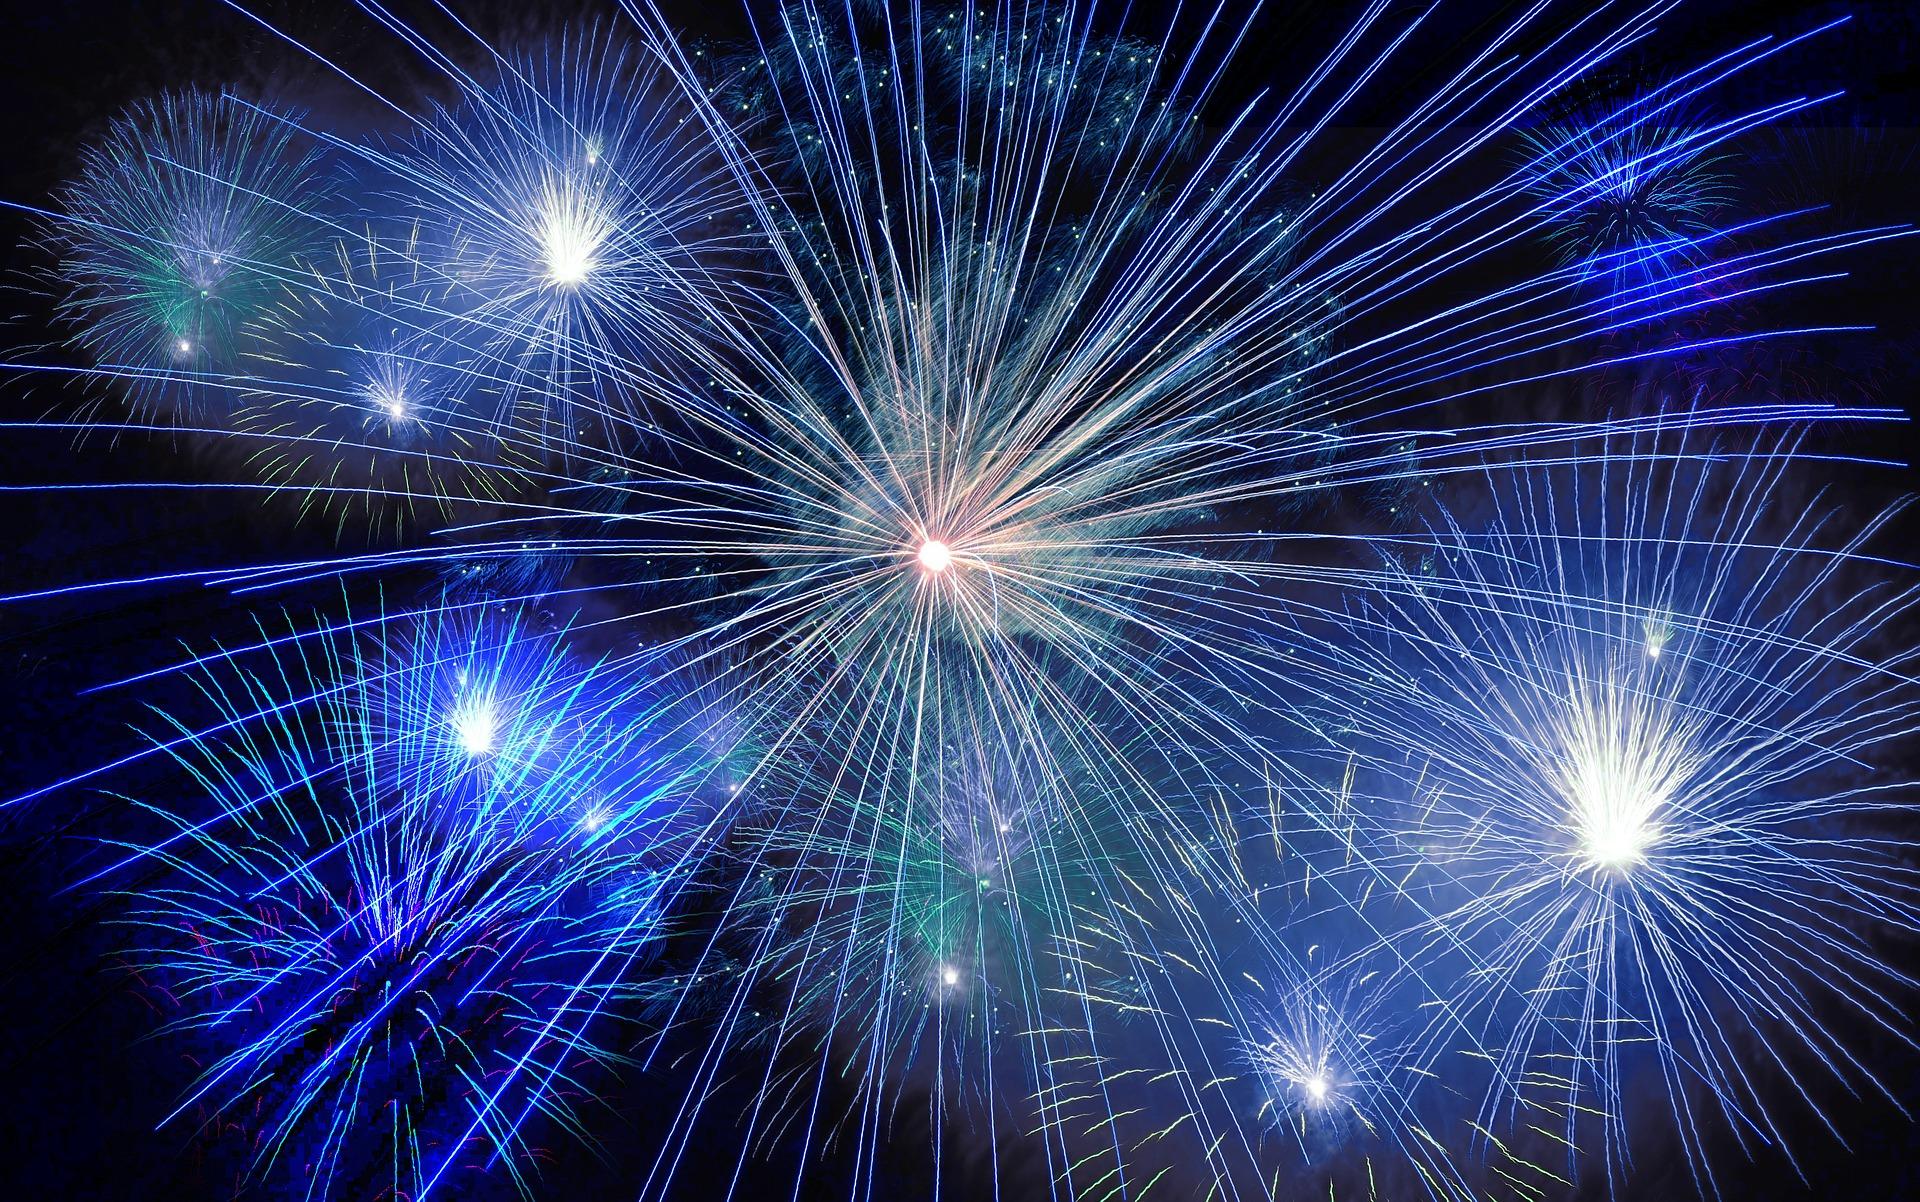 Gott nytt år - fyrverkerier